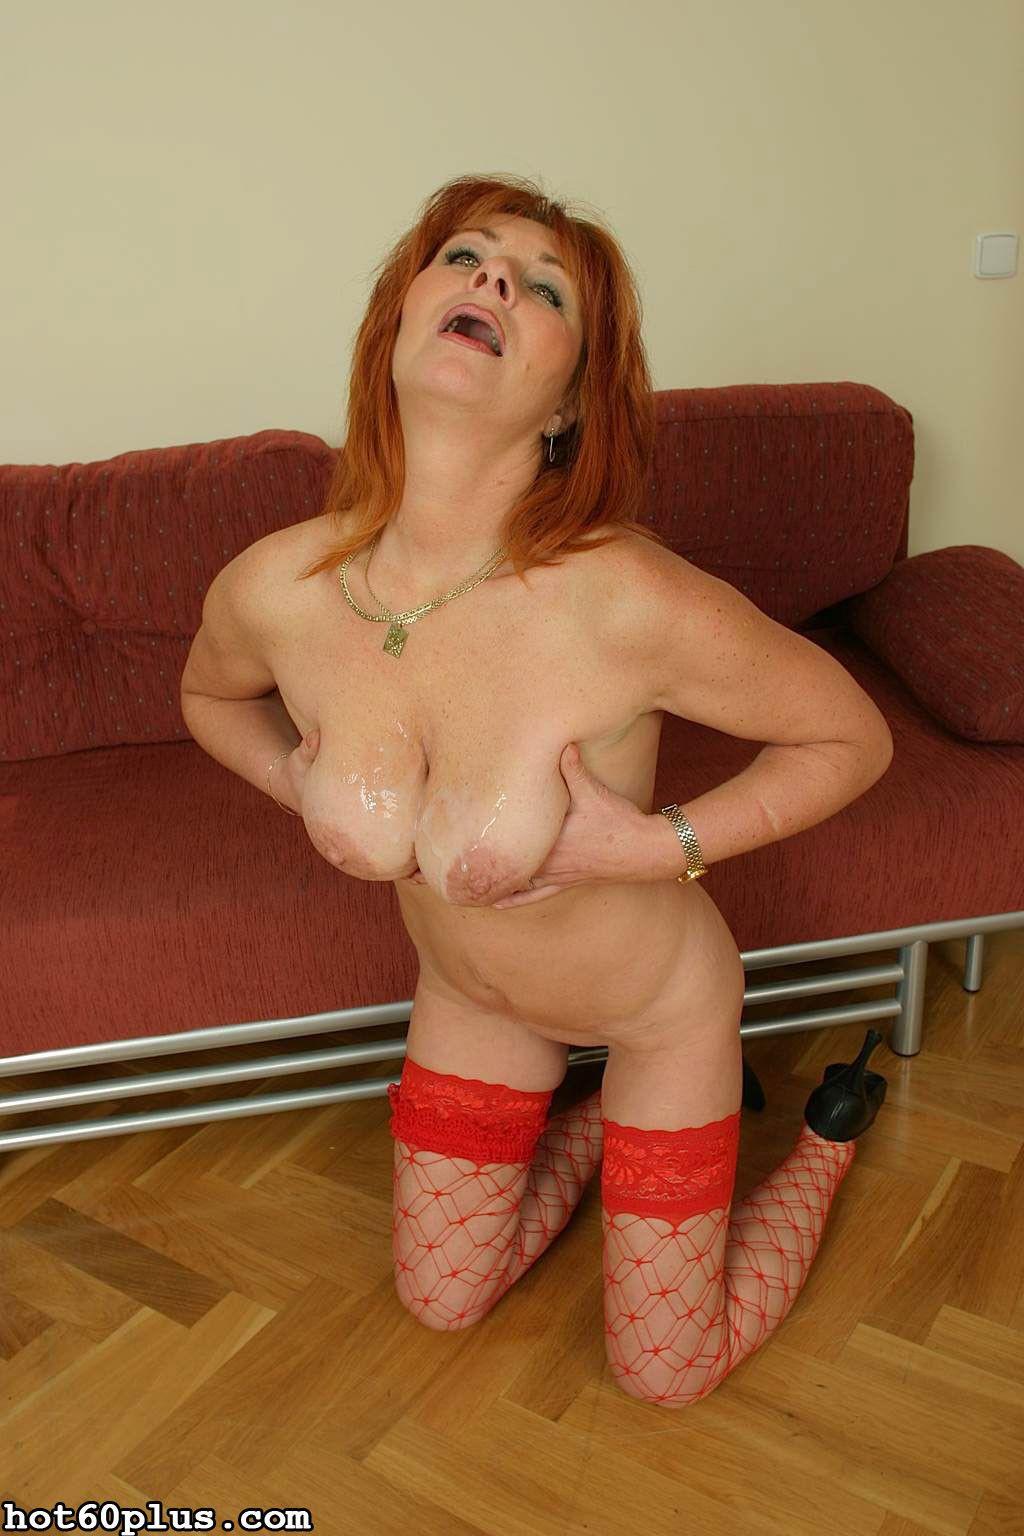 Martina - mature slut in red fishnets